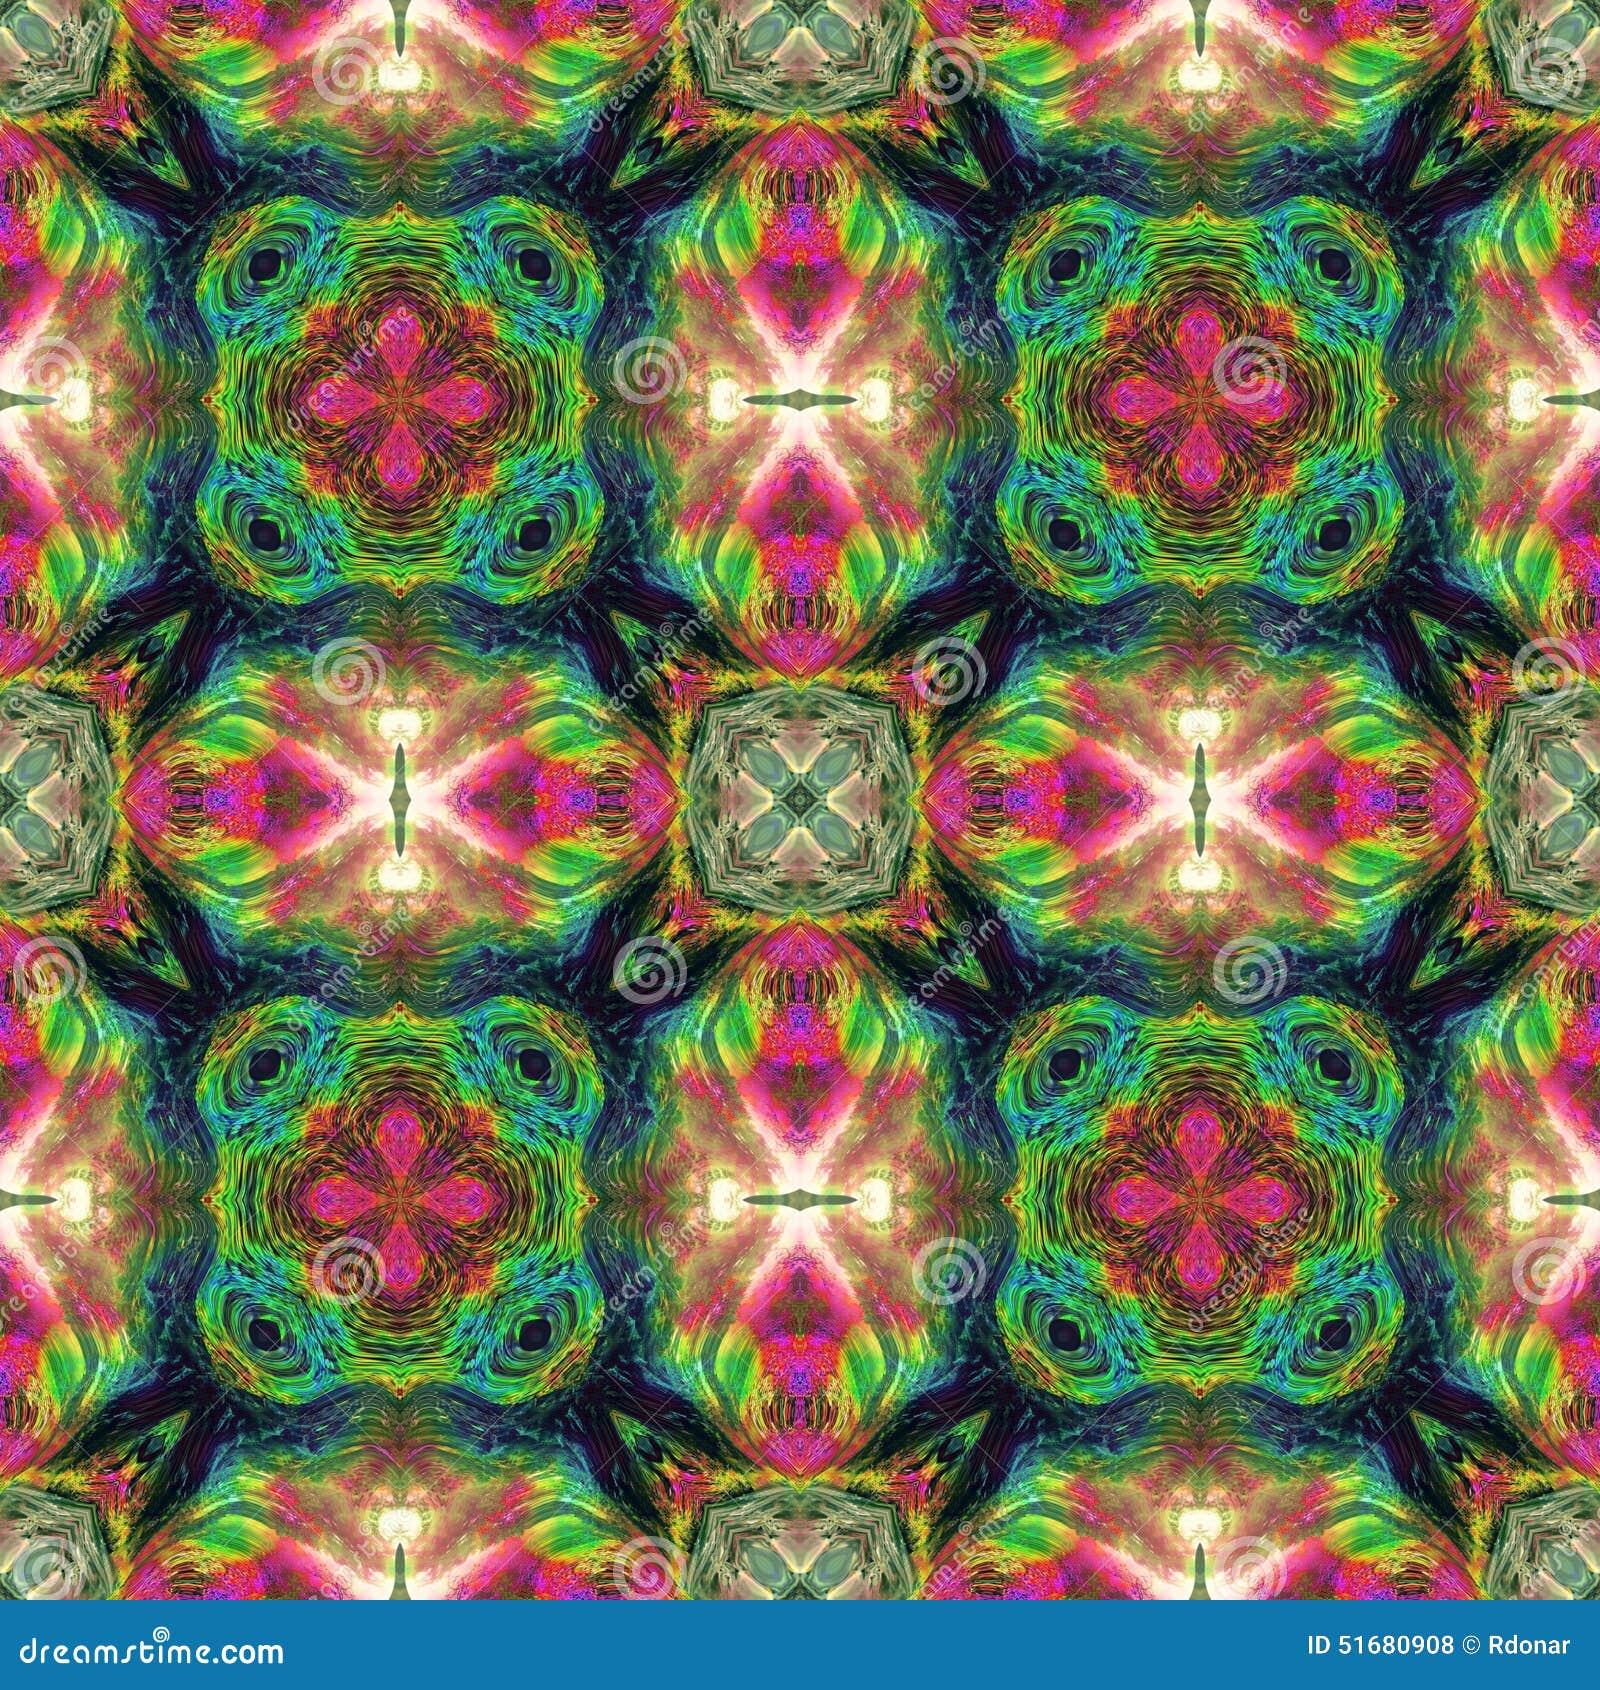 Kaleidoscopic Flower Park Background. Splited Colorful Picture ... for Flower Park Background  5lpkxo